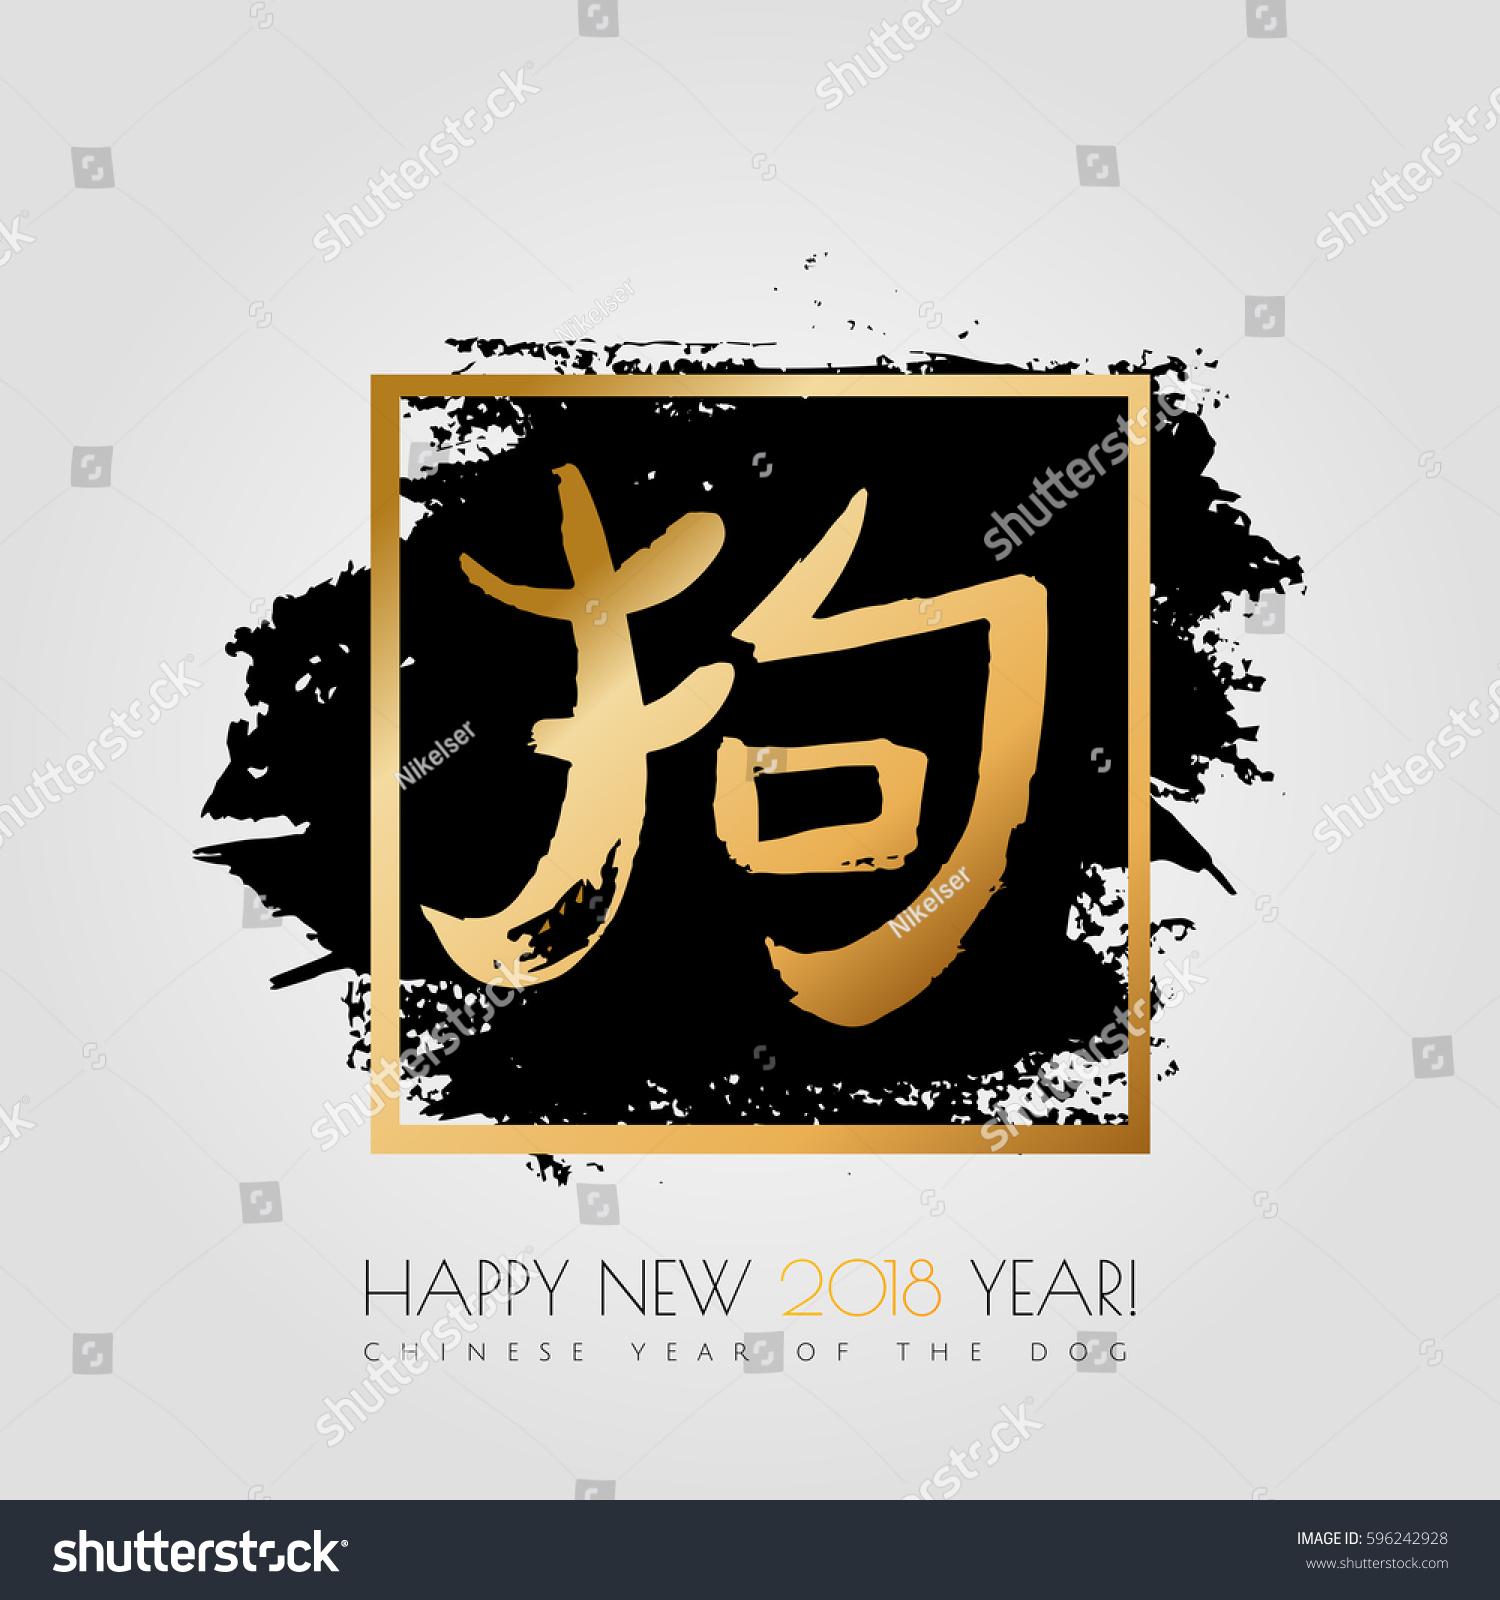 Chinese zodiac year dog stock vector